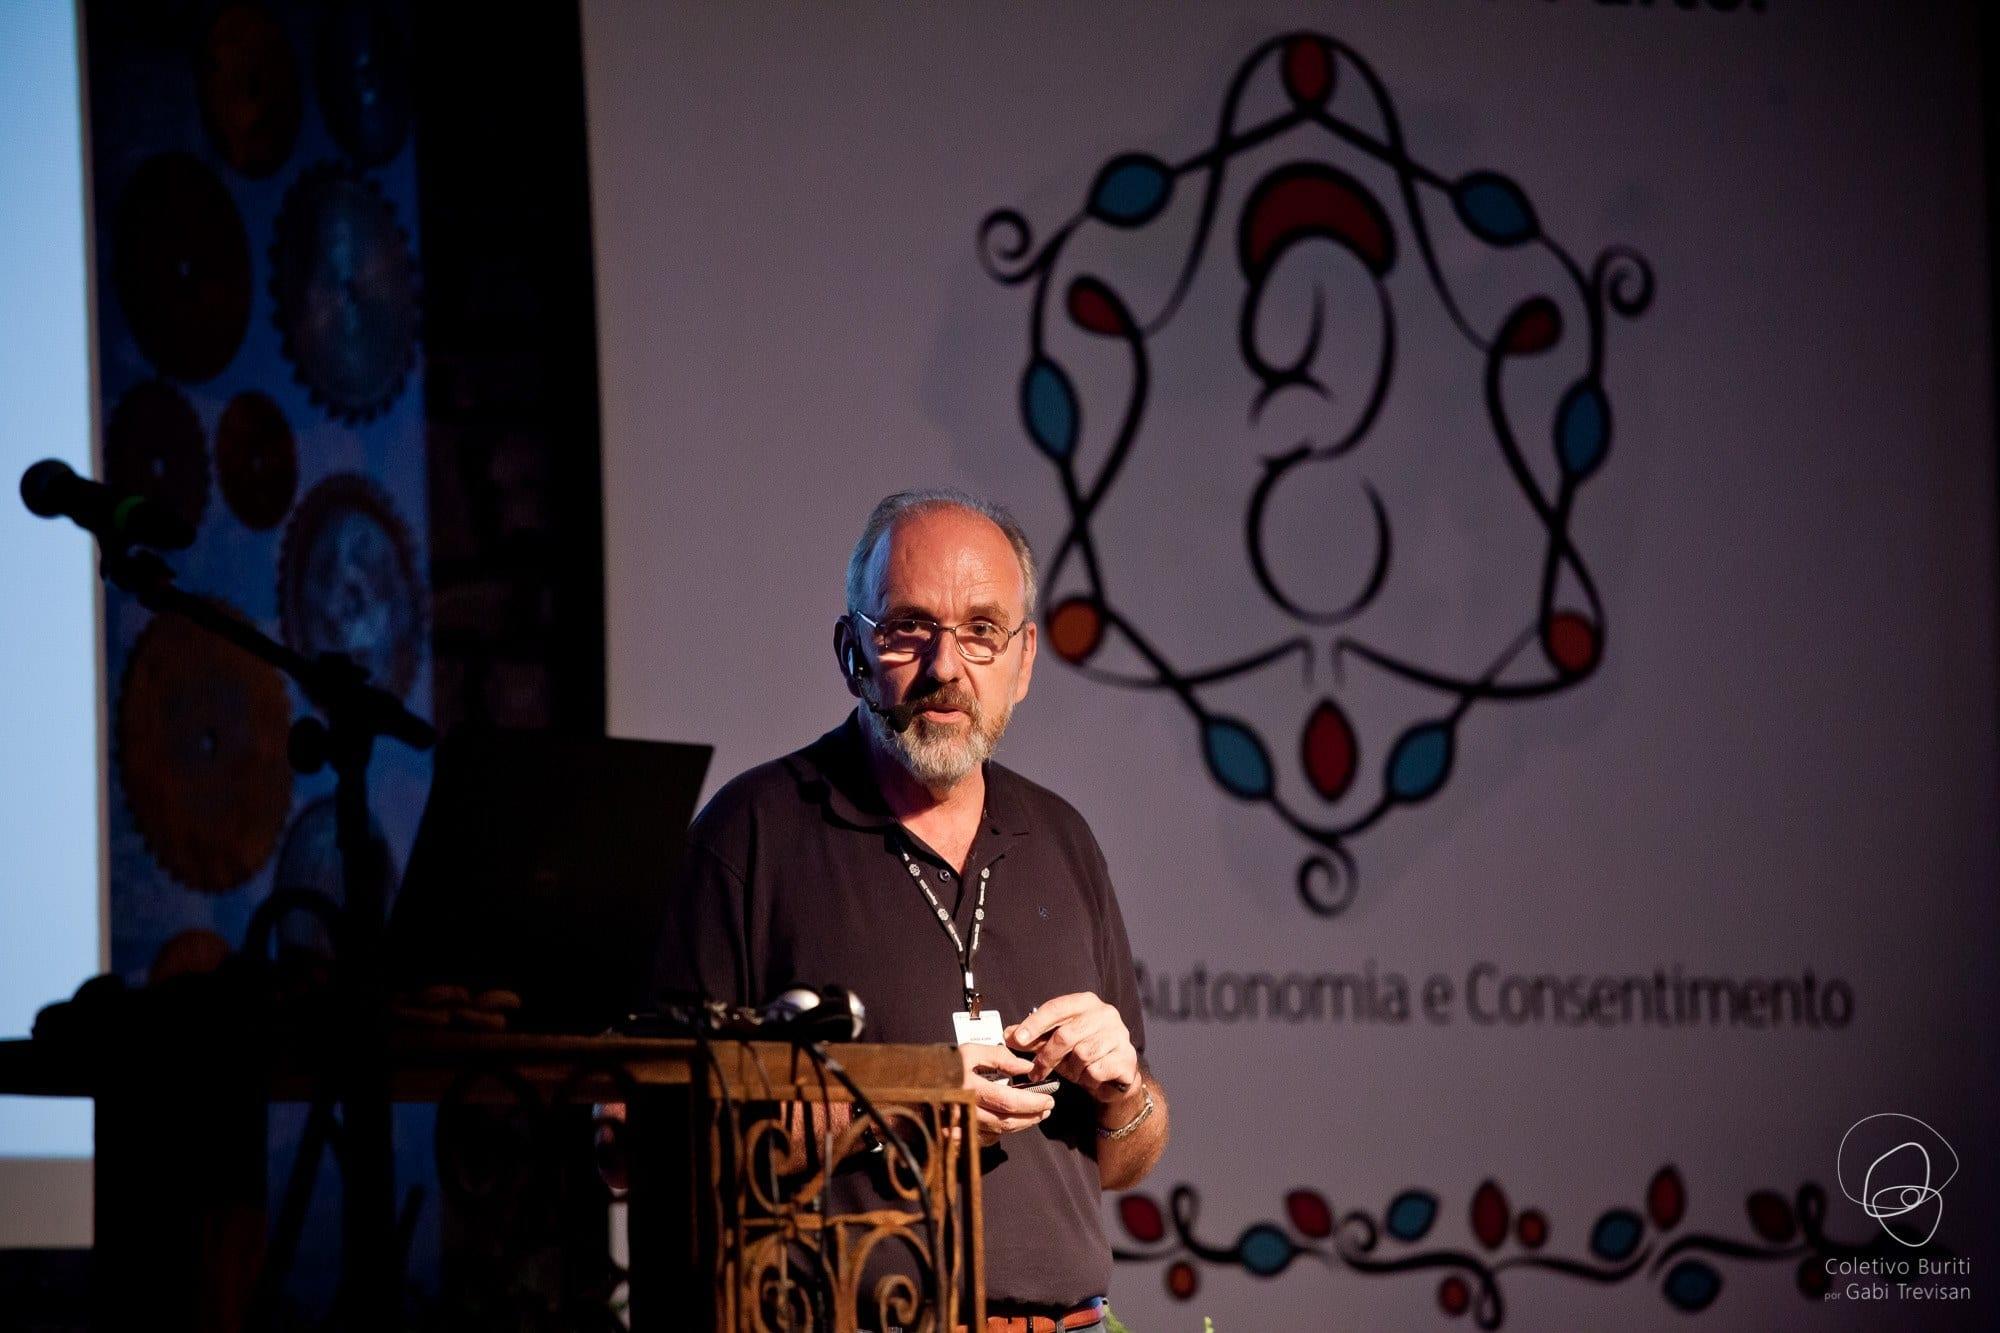 O médico Jorge Kuhn durante palestra no Siaparto (Foto: Coletivo Buriti por Gabi Trevisan)